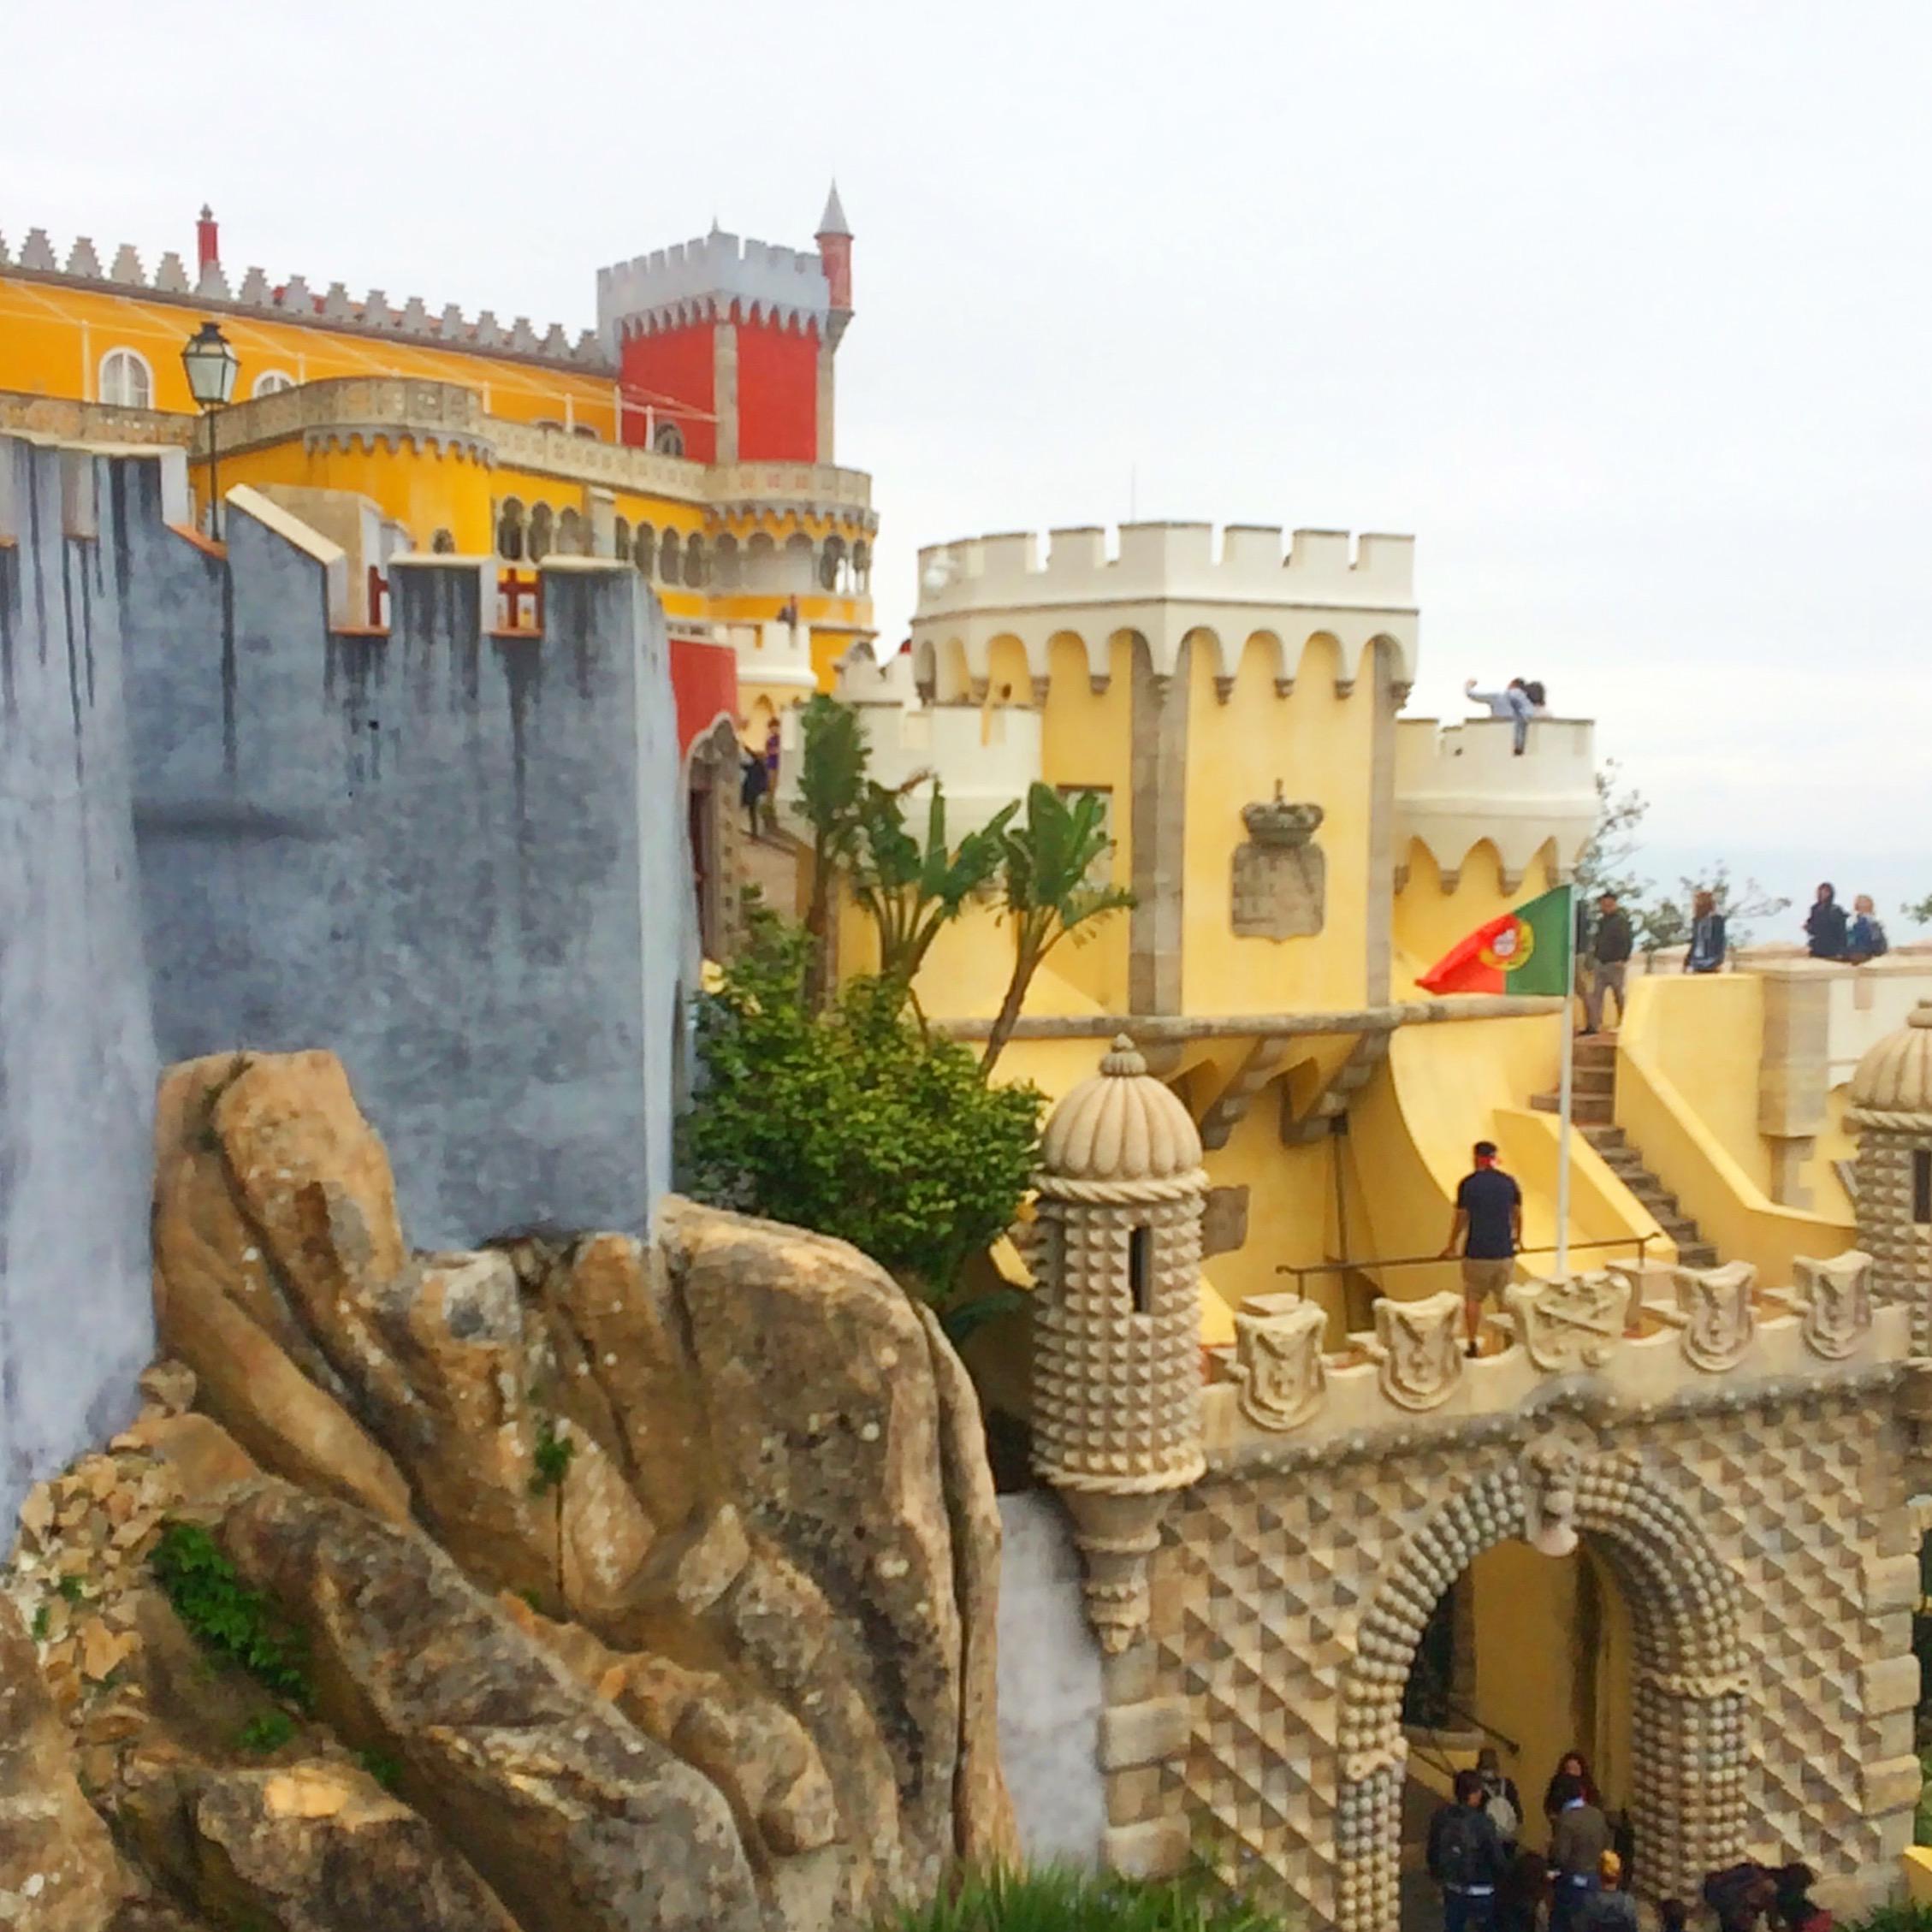 Dayka Robinson Blog Lisbon Portugal Sintra Castles Solo Travel Black Woman Oct 2016.jpg